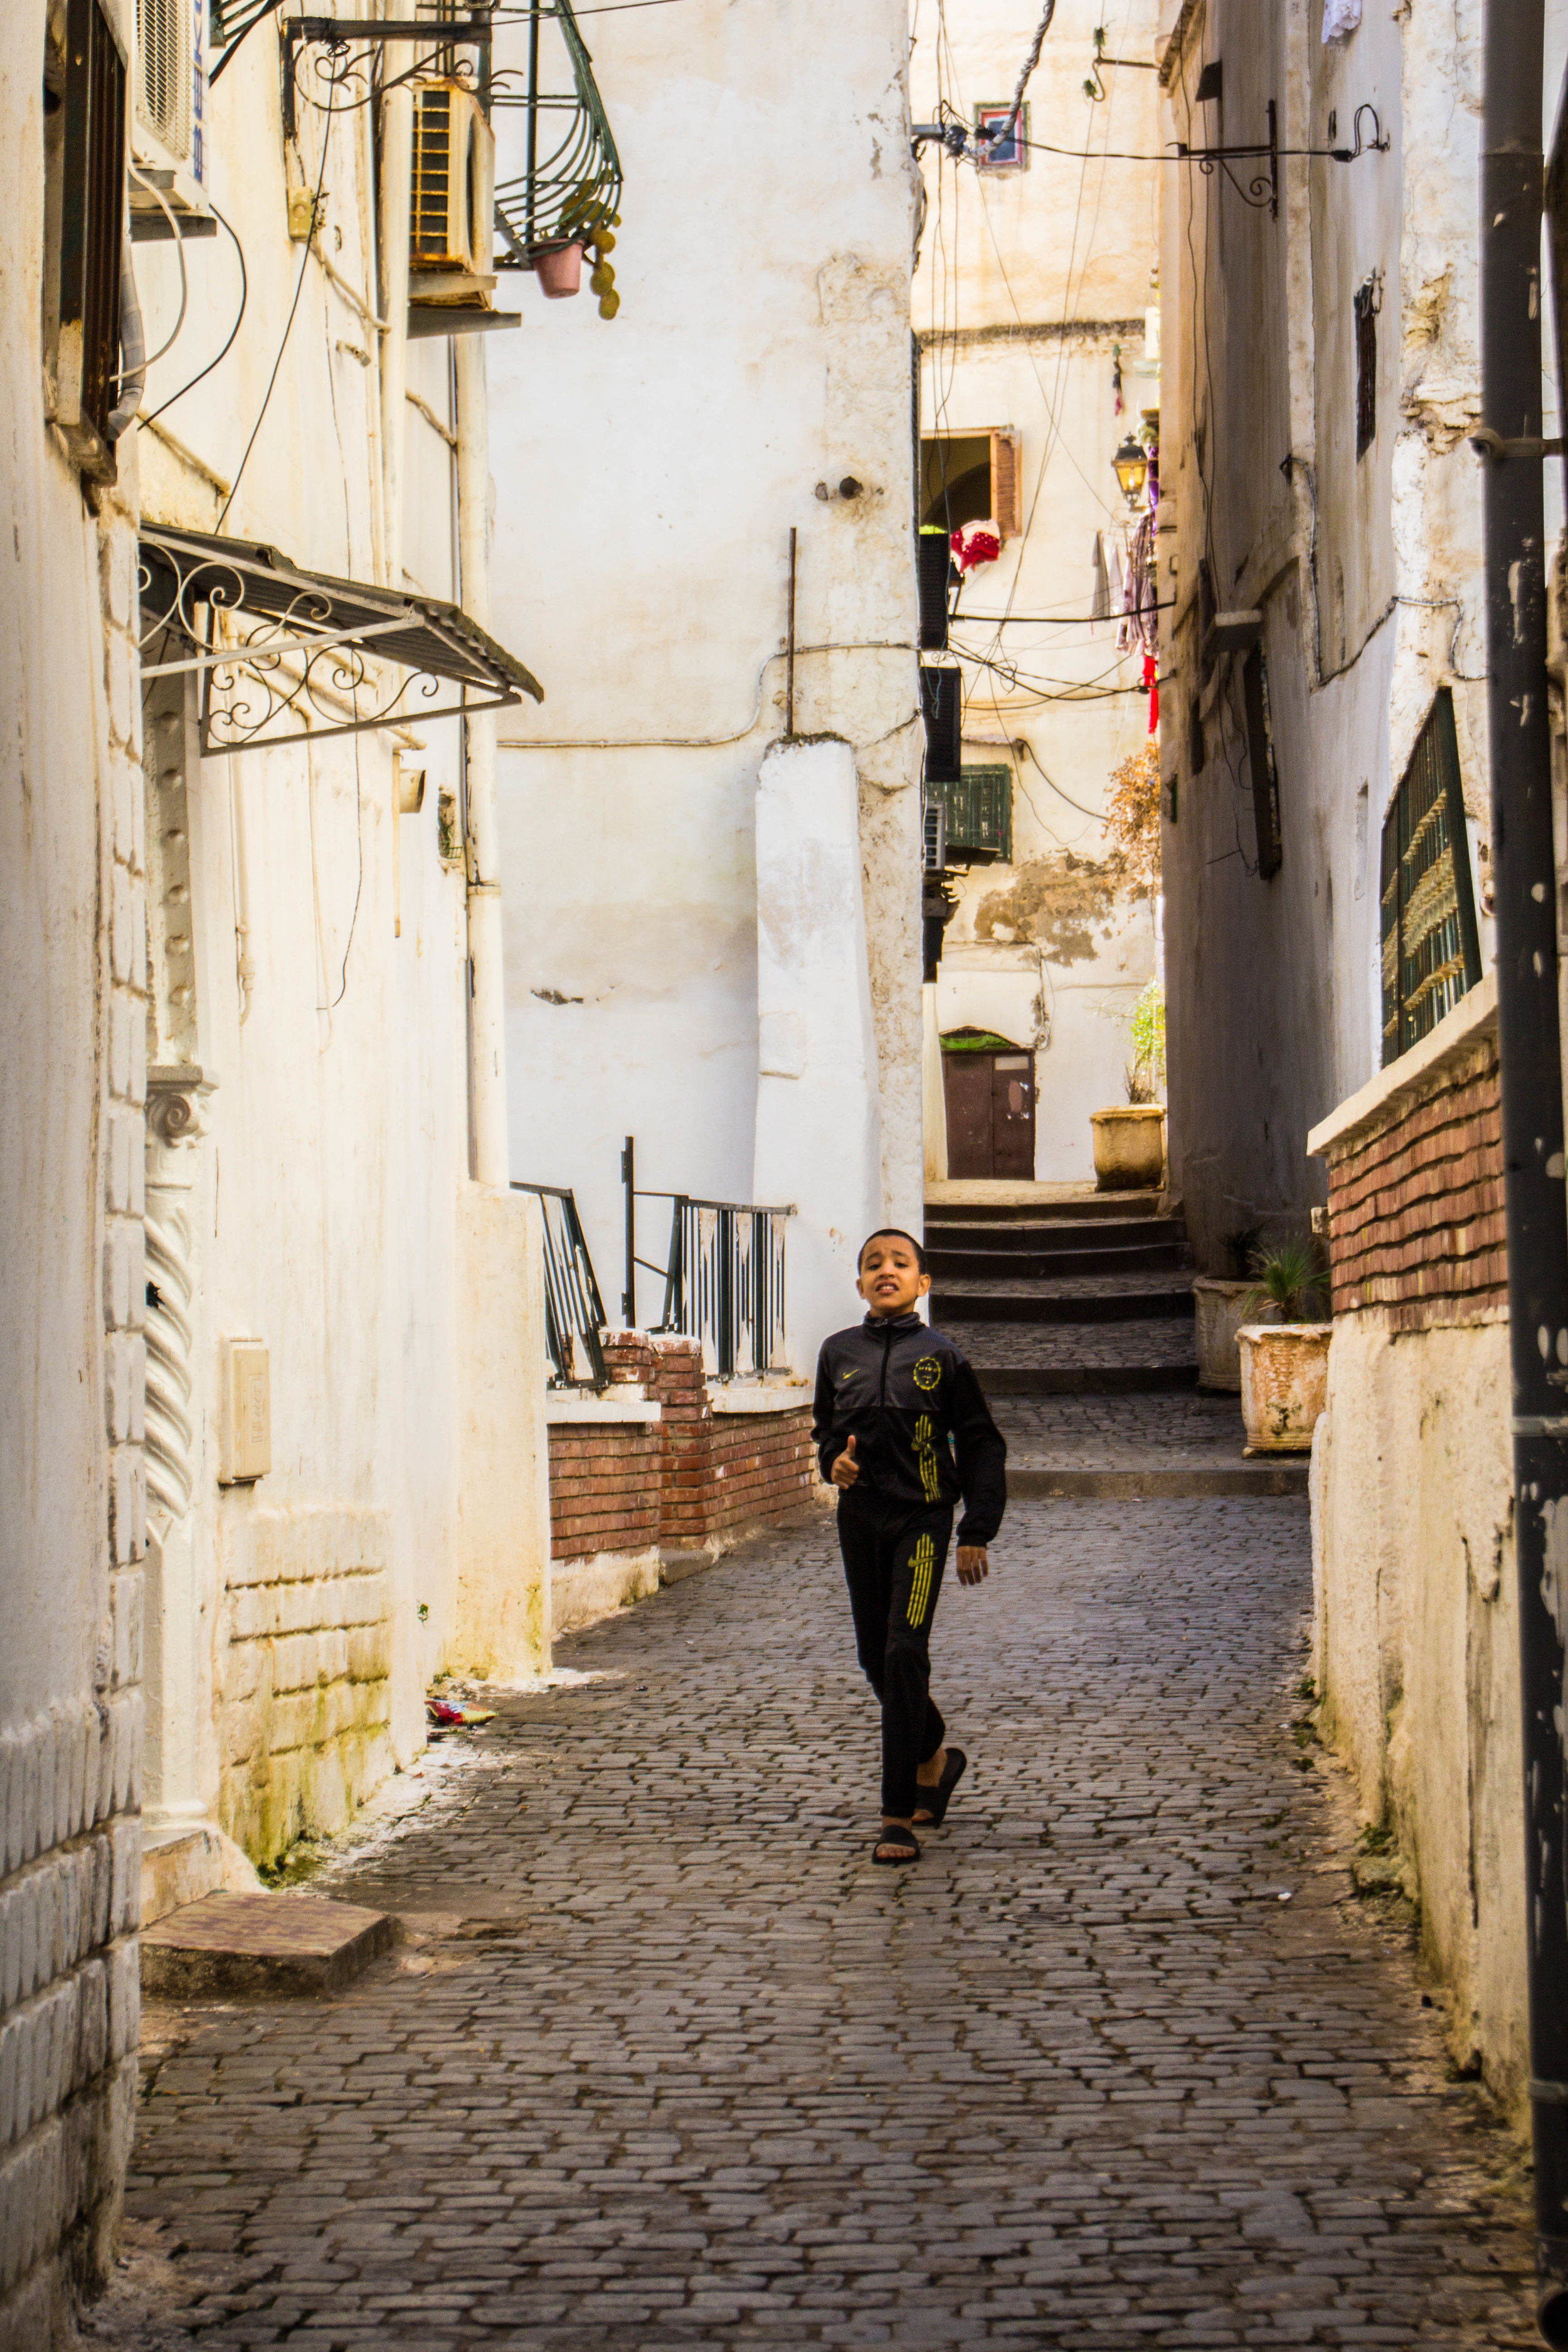 casbah-photography-algiers-algeria-alger-40.jpg